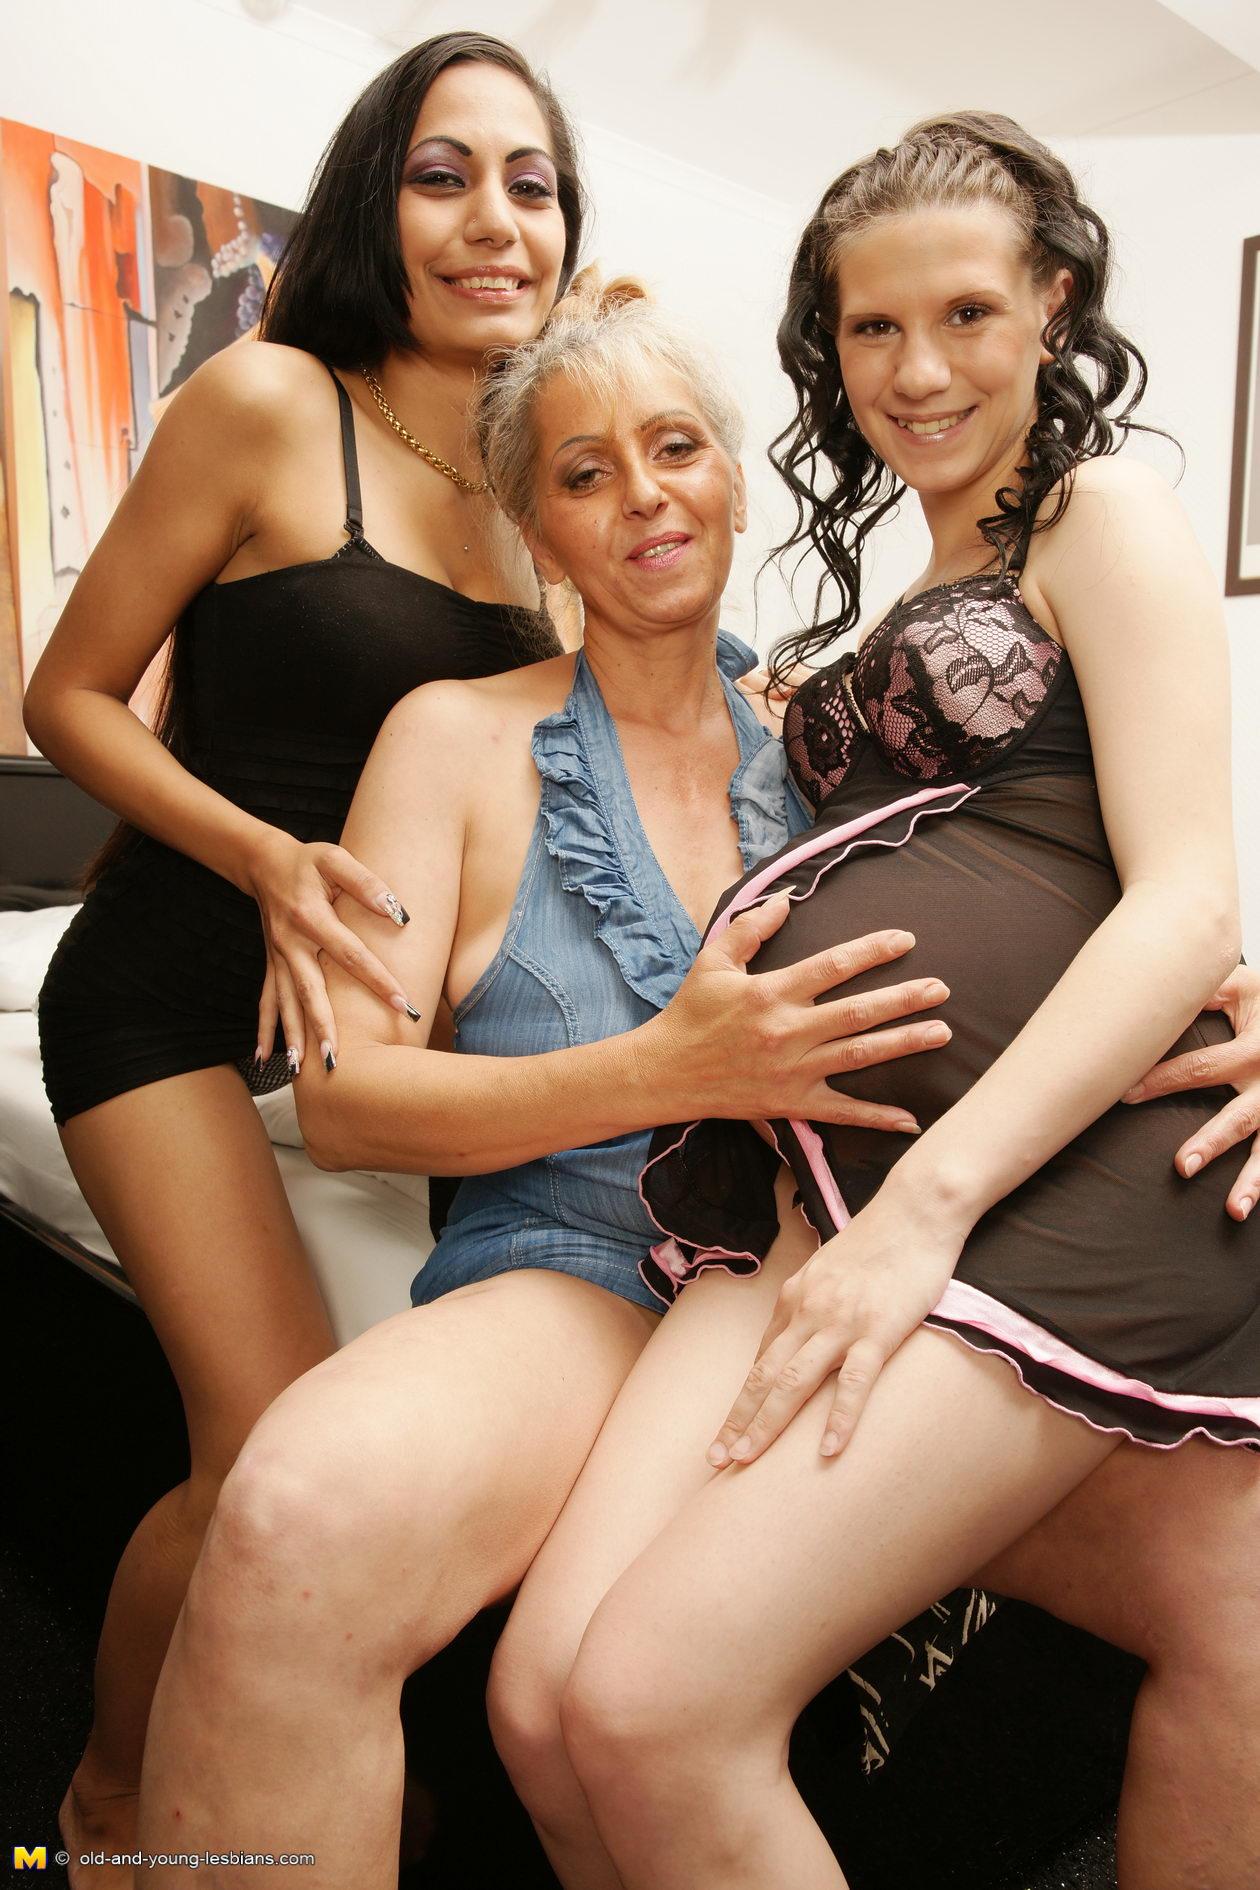 Lesbians nude mature Lesbian Tube